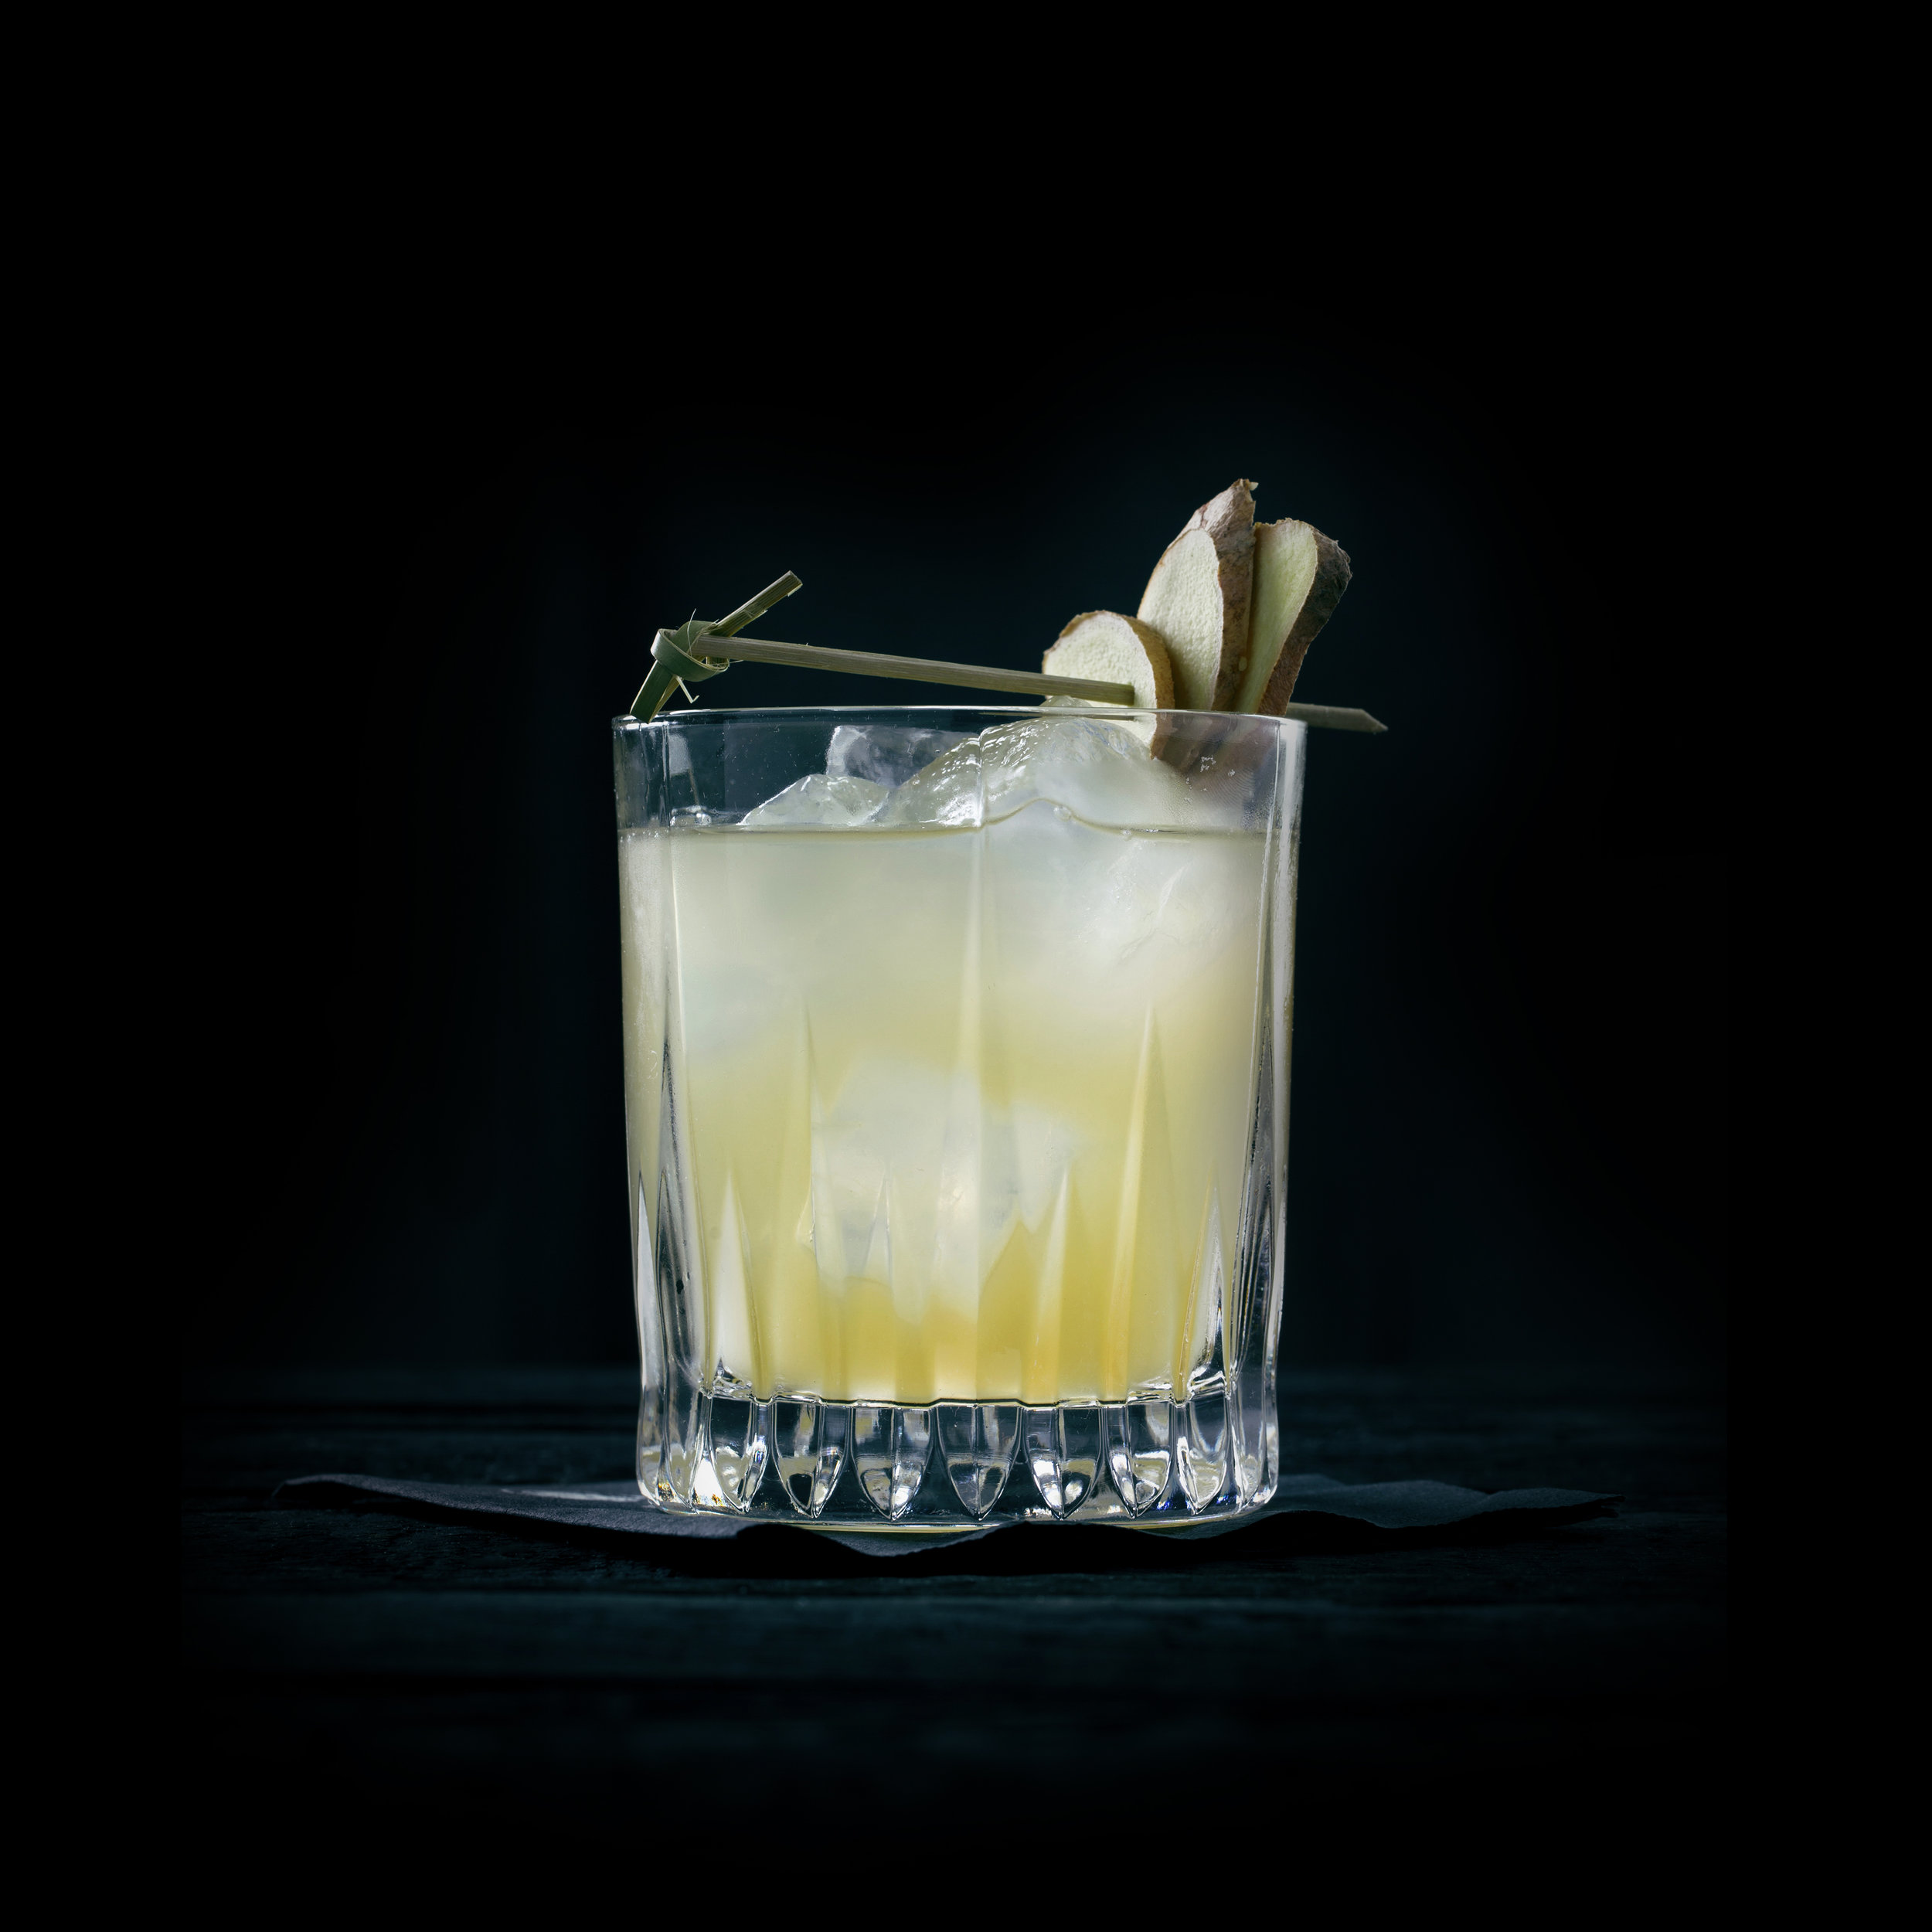 NIÑA PIÑA  INGREDIENTS  - 1.5 oz. El Silencio Espadin - 1 oz. Fresh Pineapple Juice - 1 oz Ginger syrup - Lime - Soda  METHOD  Combine ingredients, shake, pour, top with soda, garnish with ginger